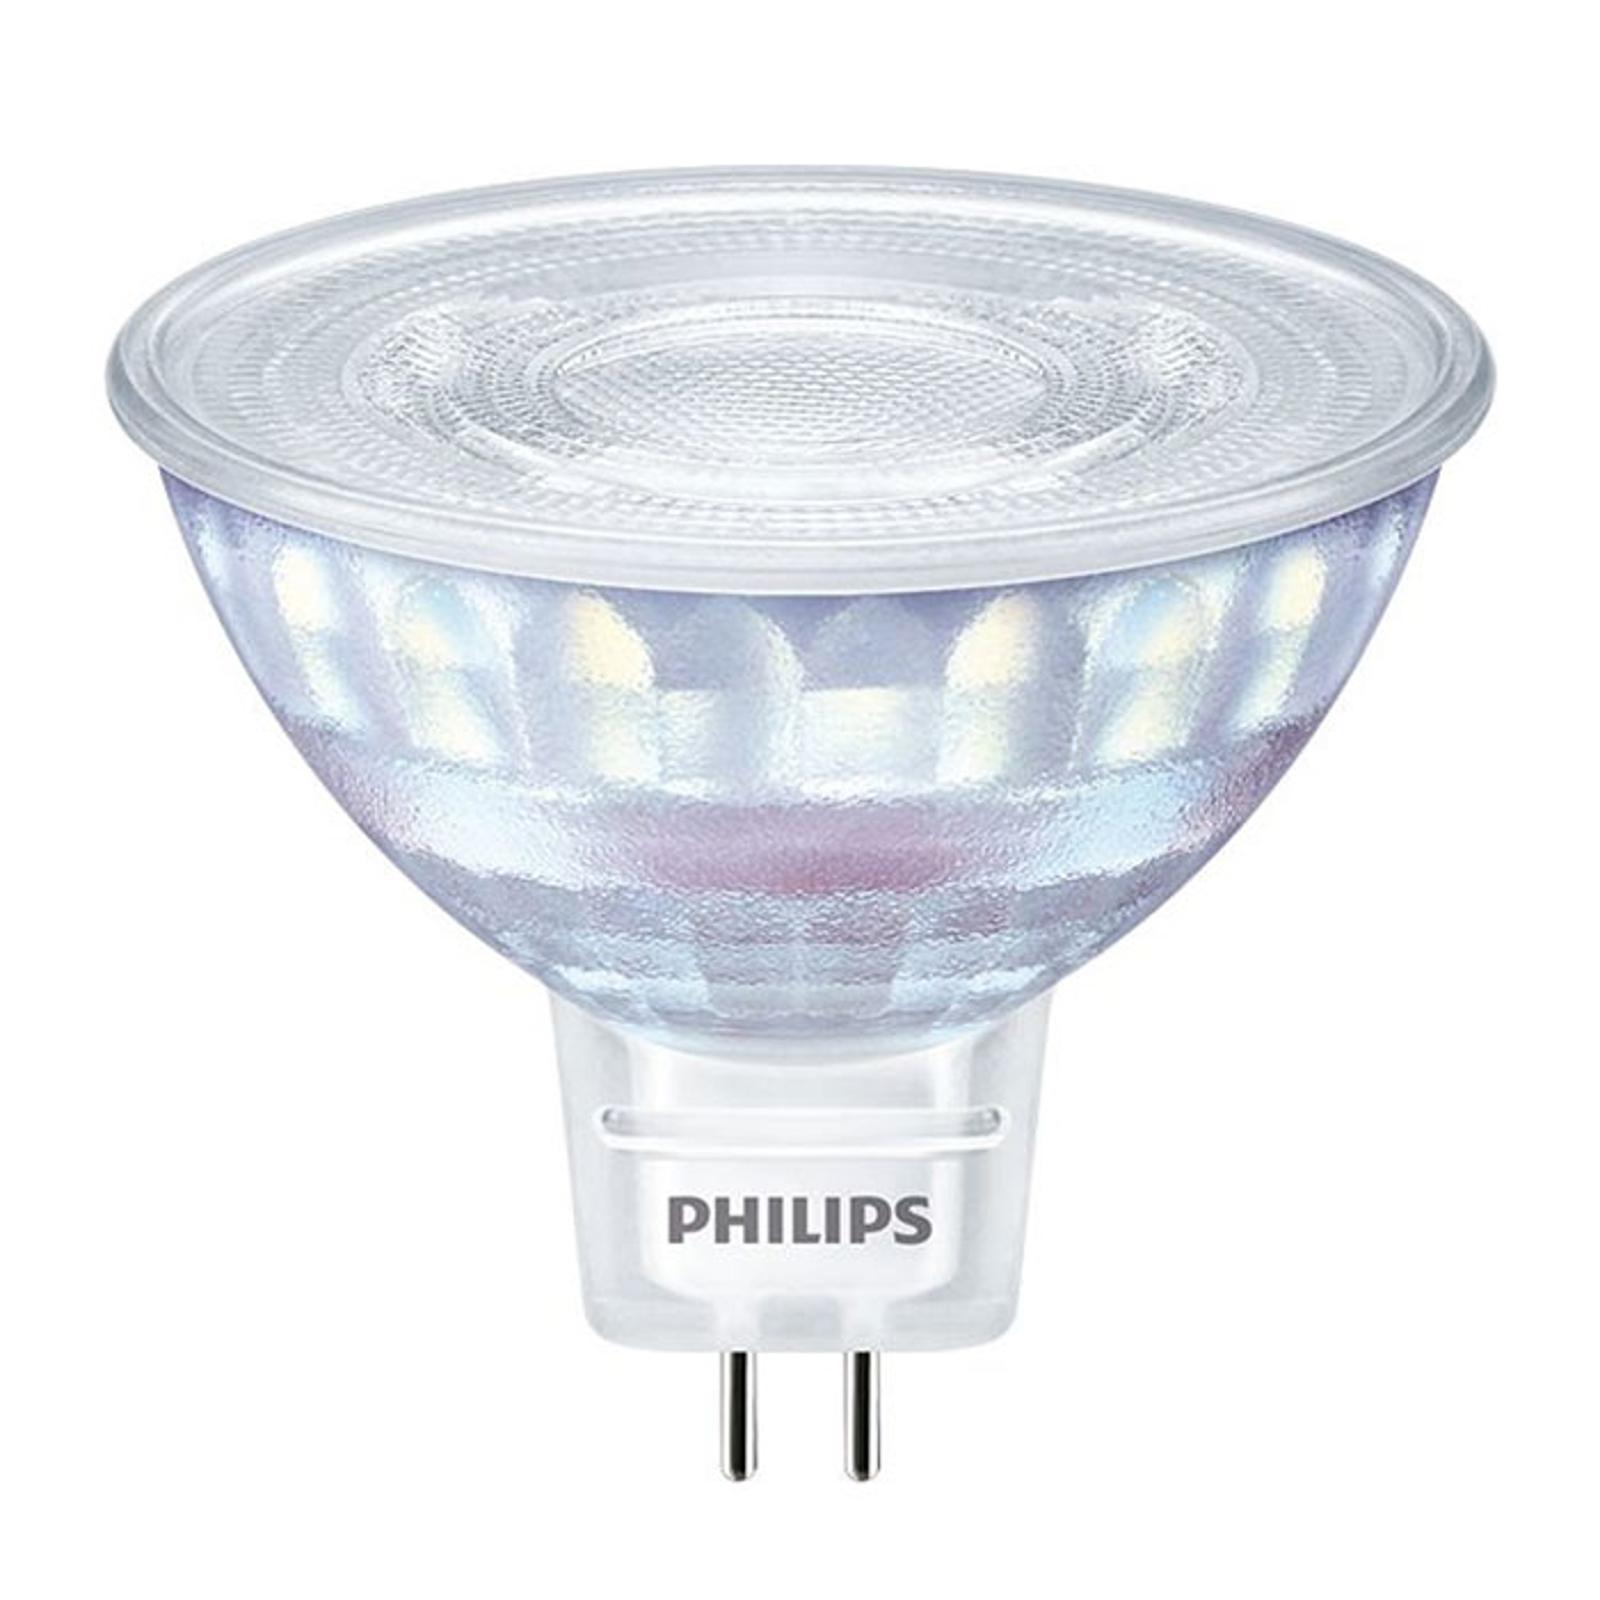 Philips LED Reflektor GU5,3 7W dimmbar warmglow